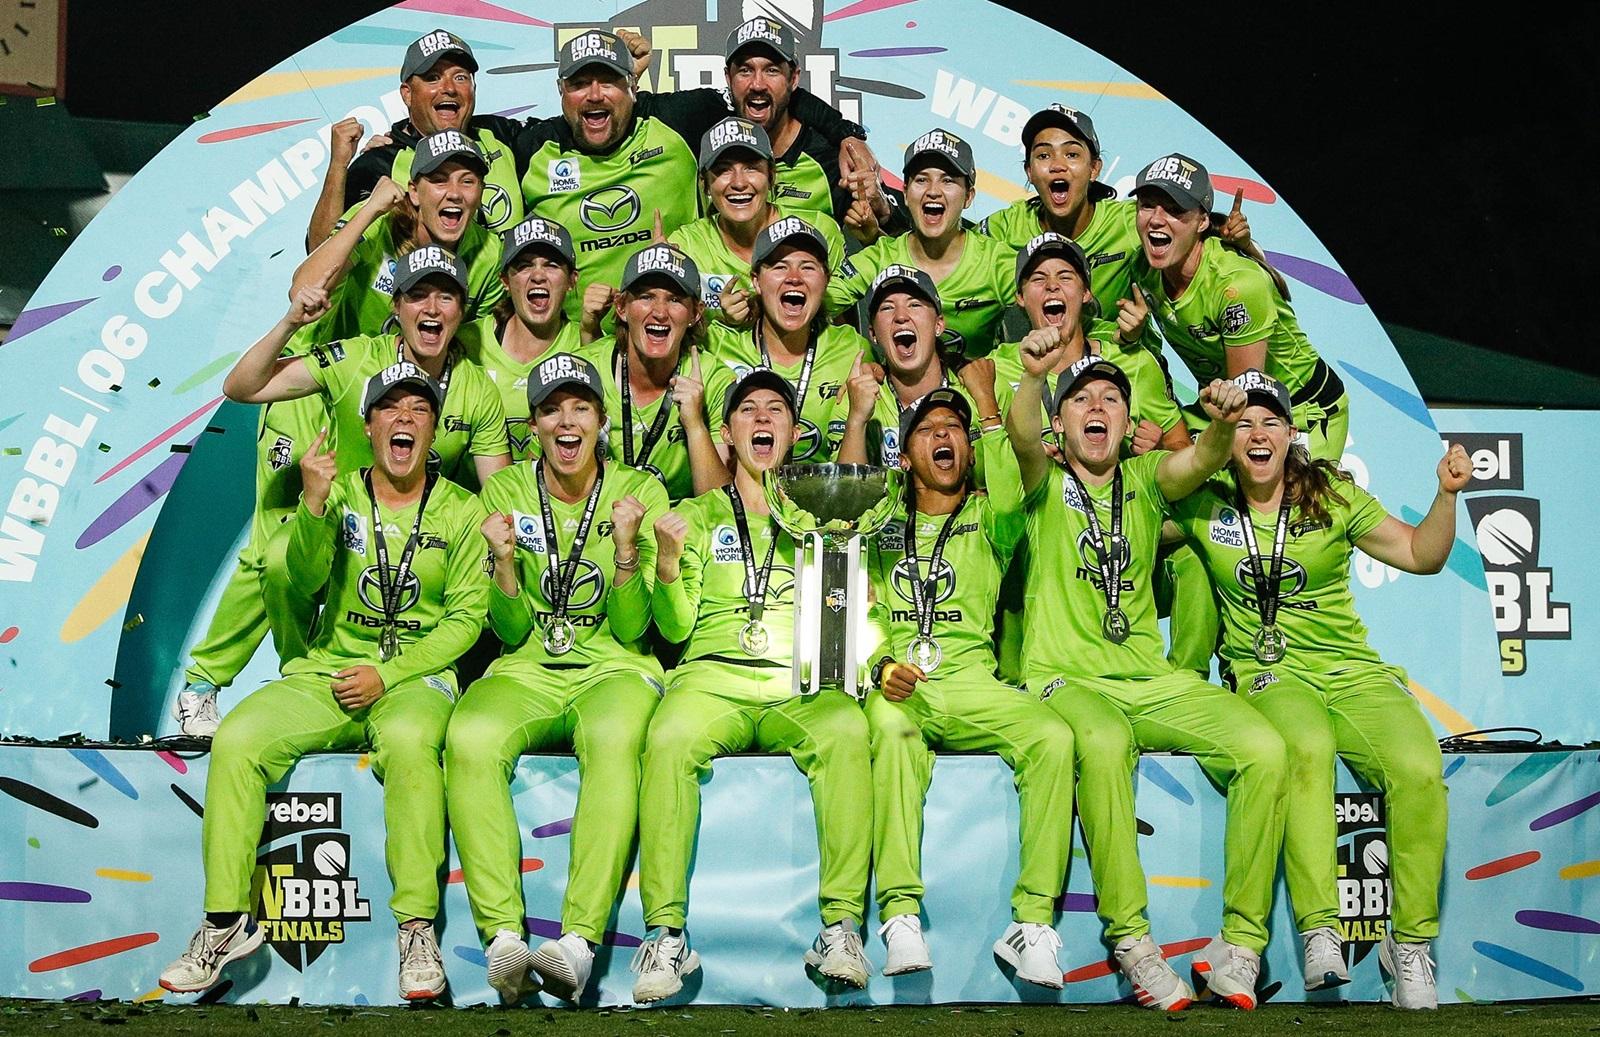 More televised games highlight WBBL 07 fixture   cricket.com.au